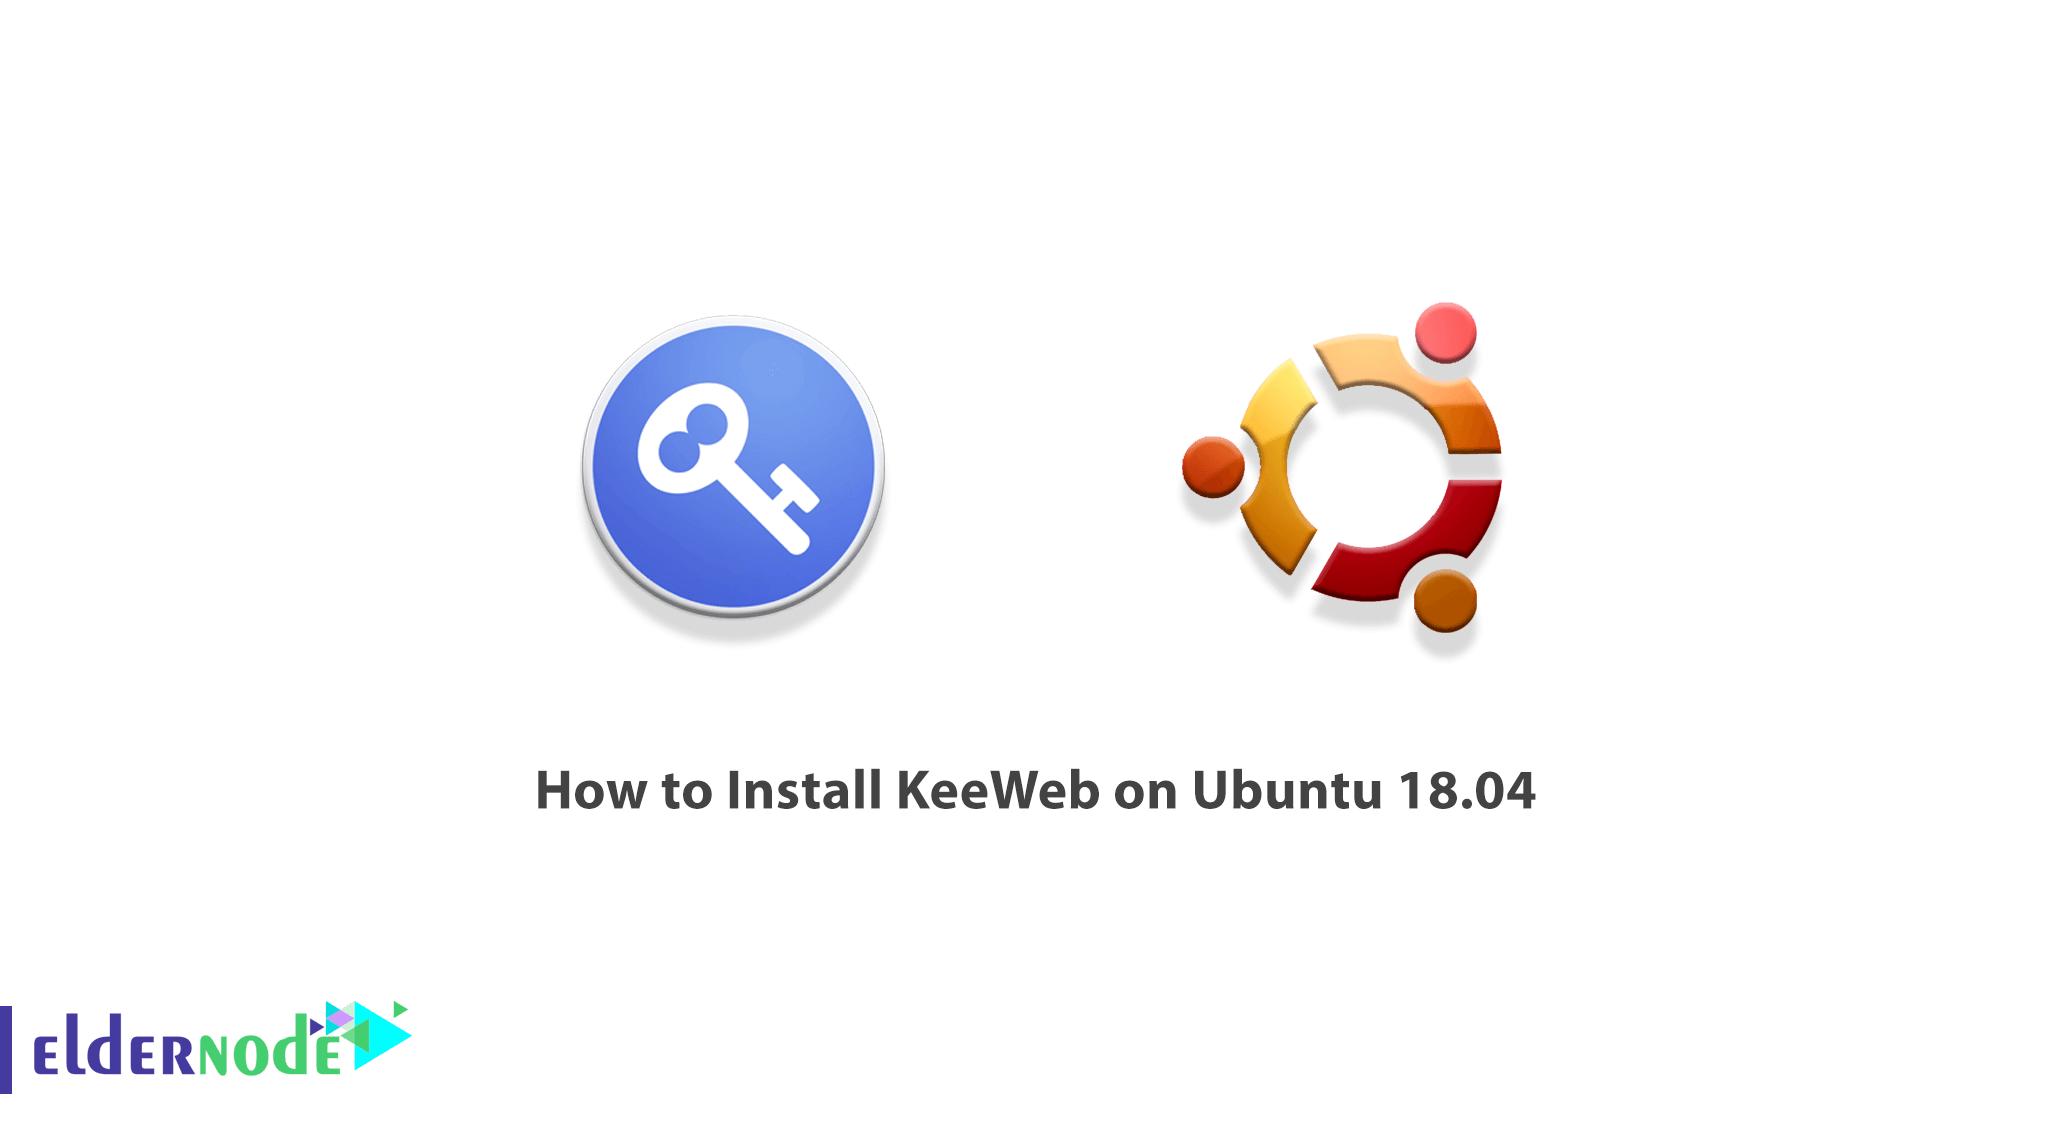 How to Install KeeWeb on Ubuntu 18.04